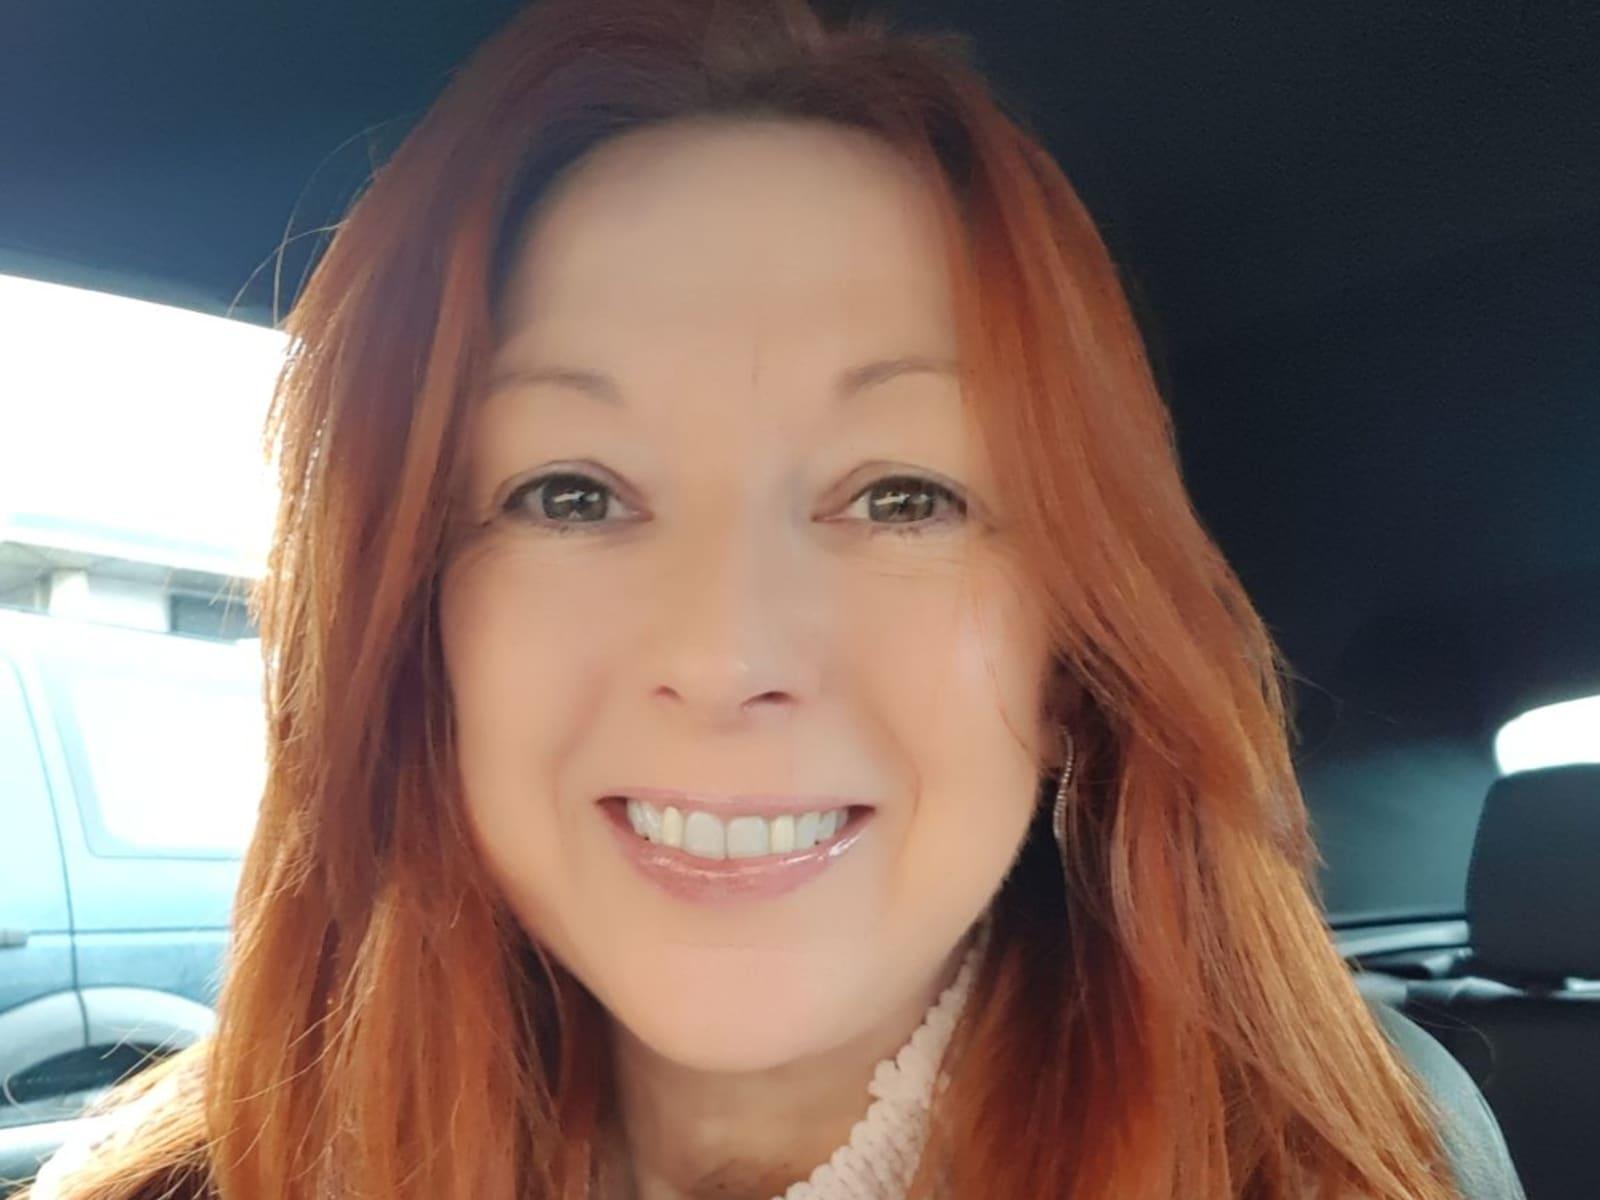 Wendy from Codsall, United Kingdom